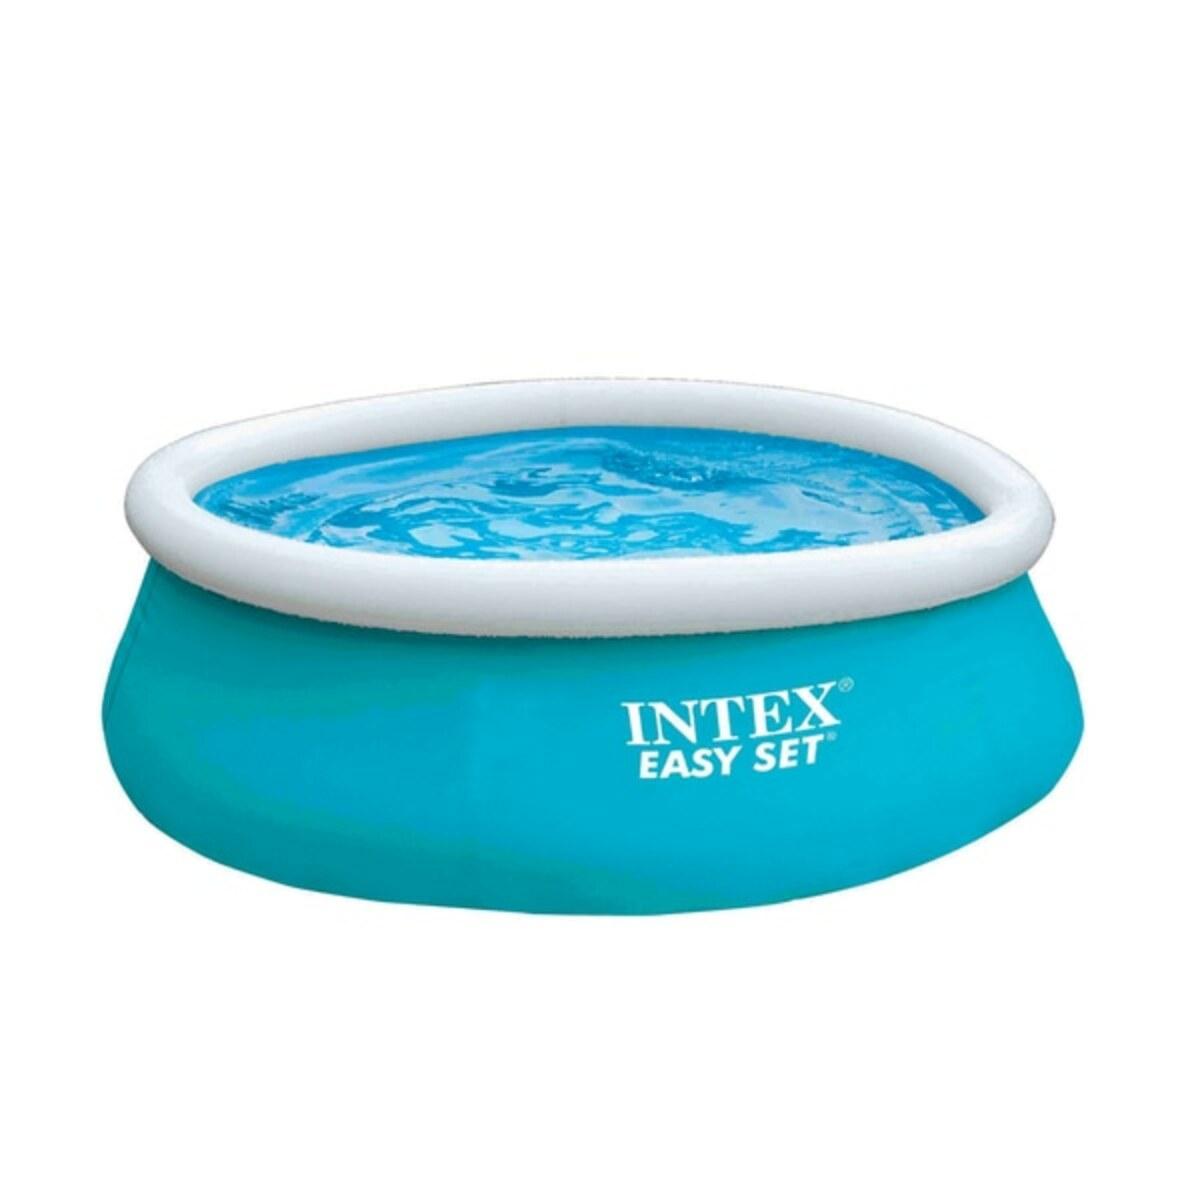 Bild 1 von Intex - Pool Easy Set, 183 cm x 51 cm